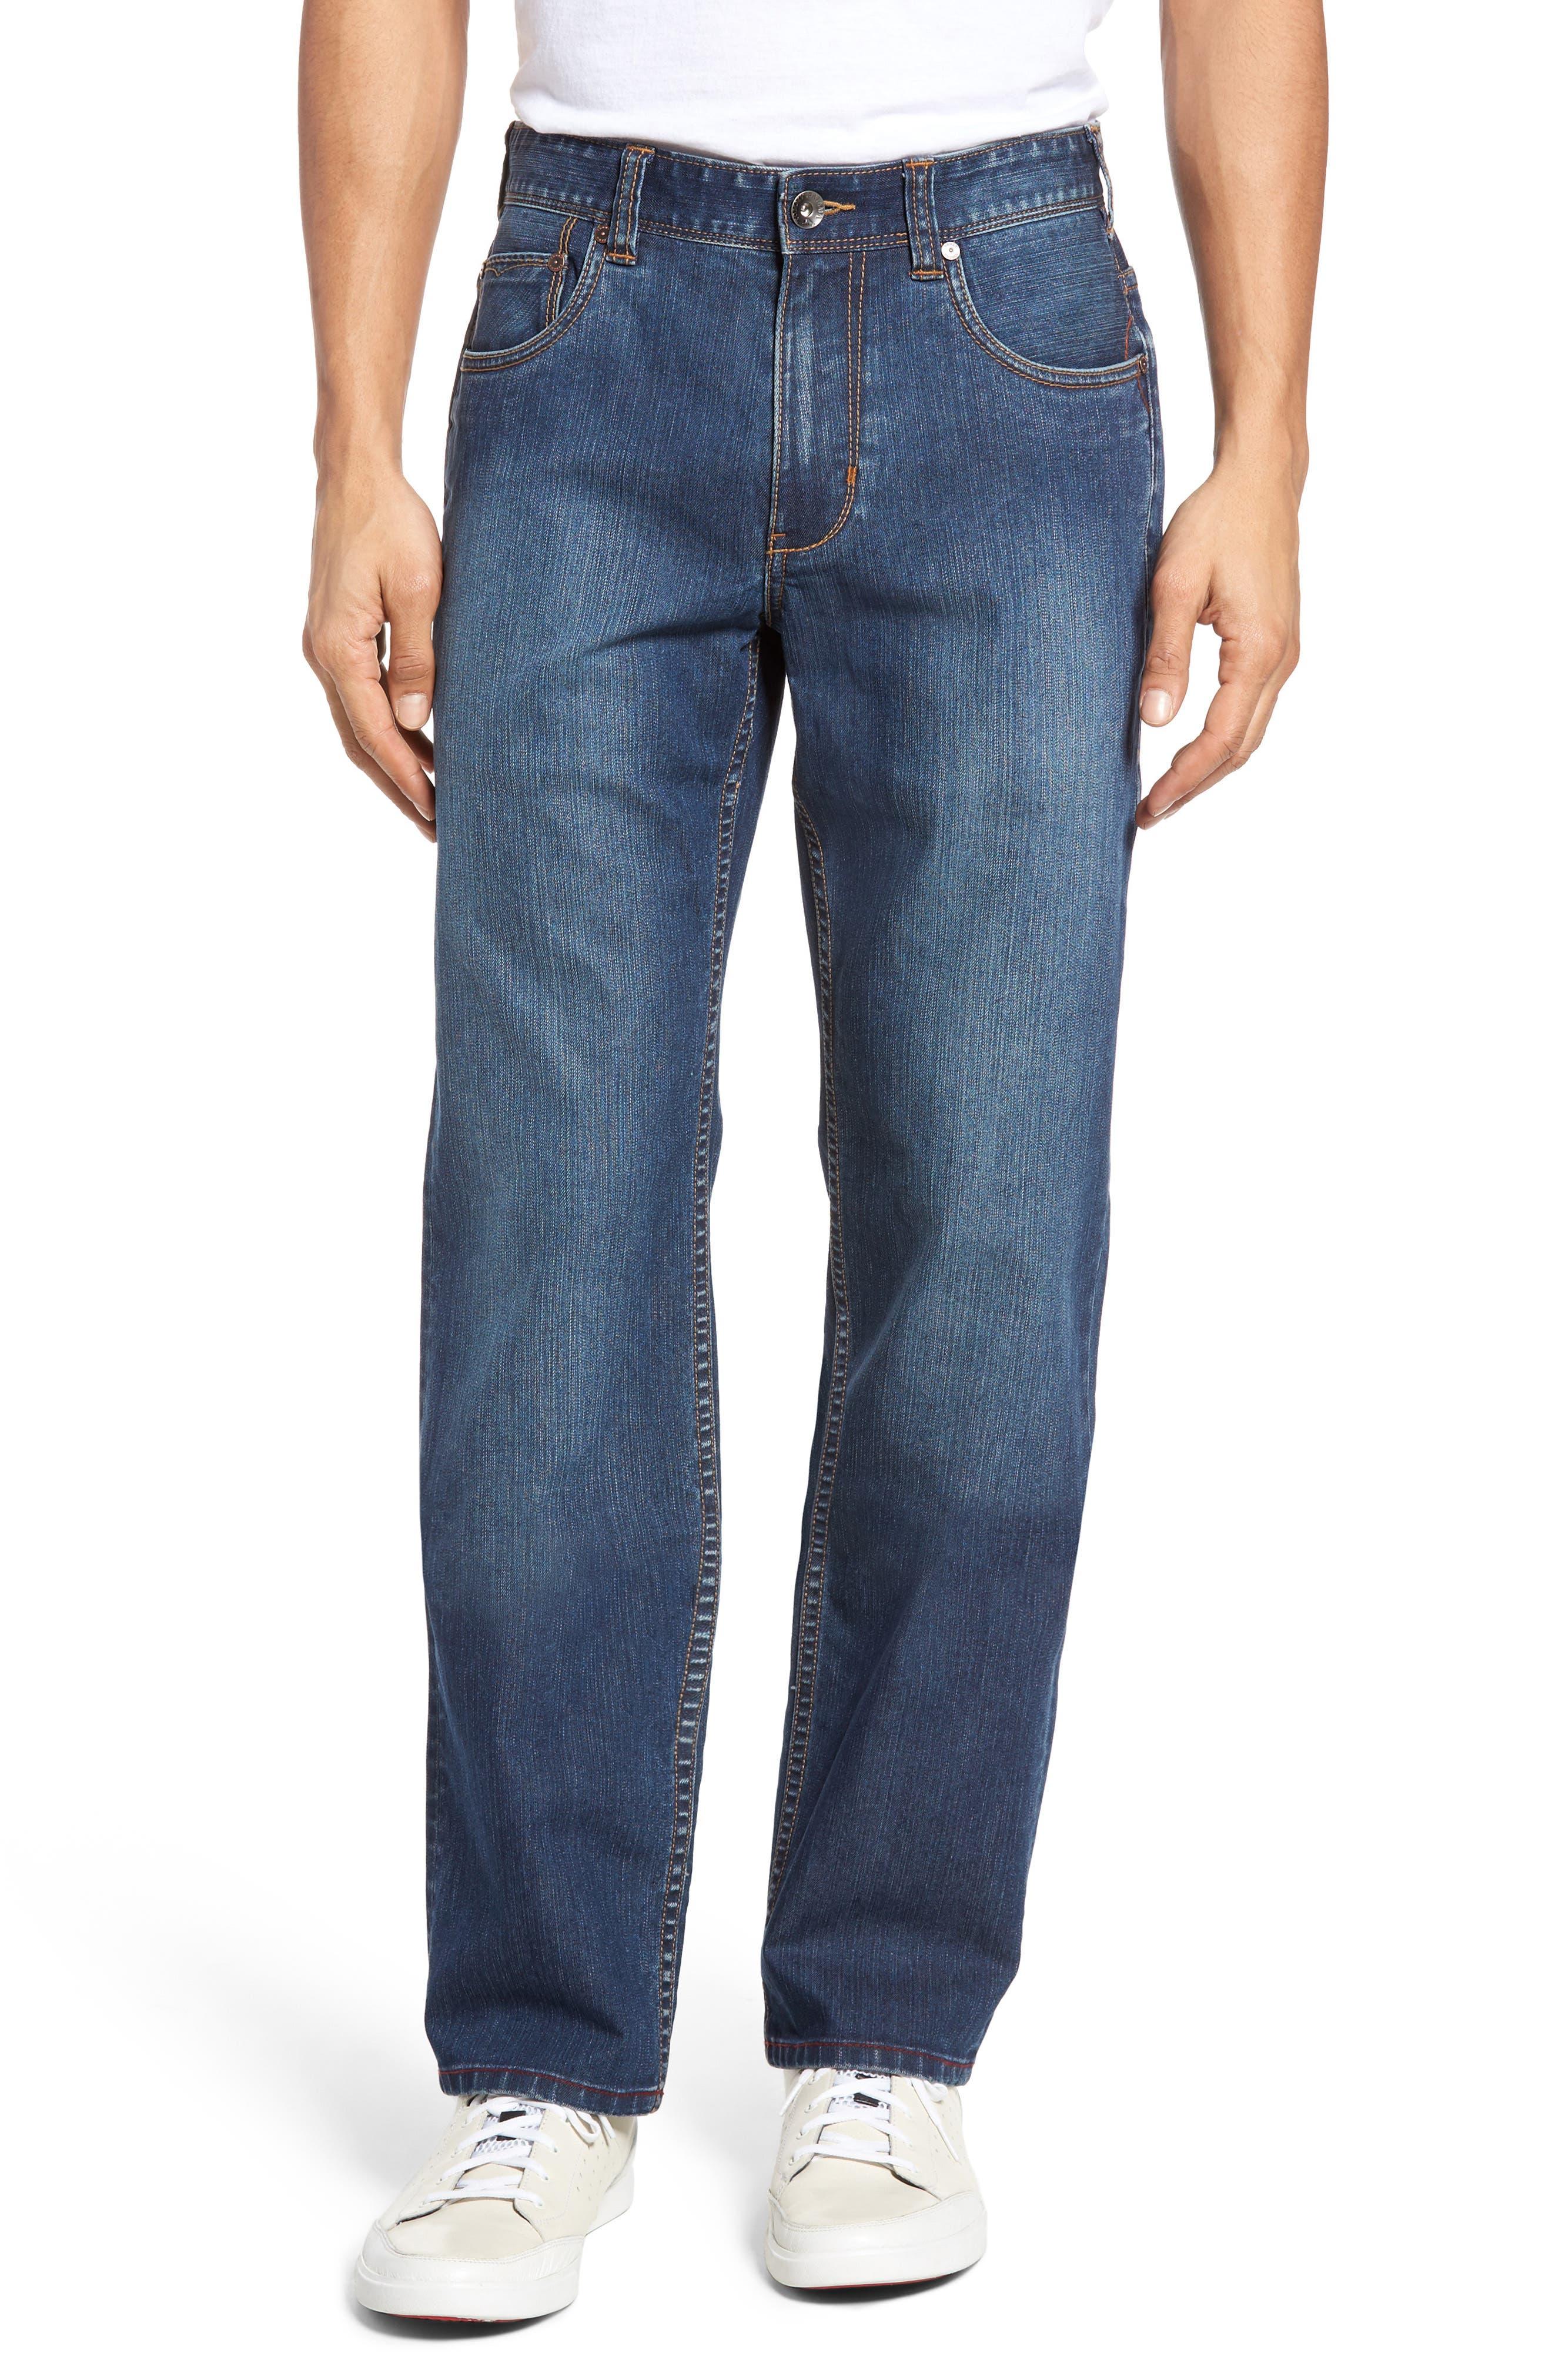 Sorrento Straight Leg Jeans,                             Main thumbnail 1, color,                             400